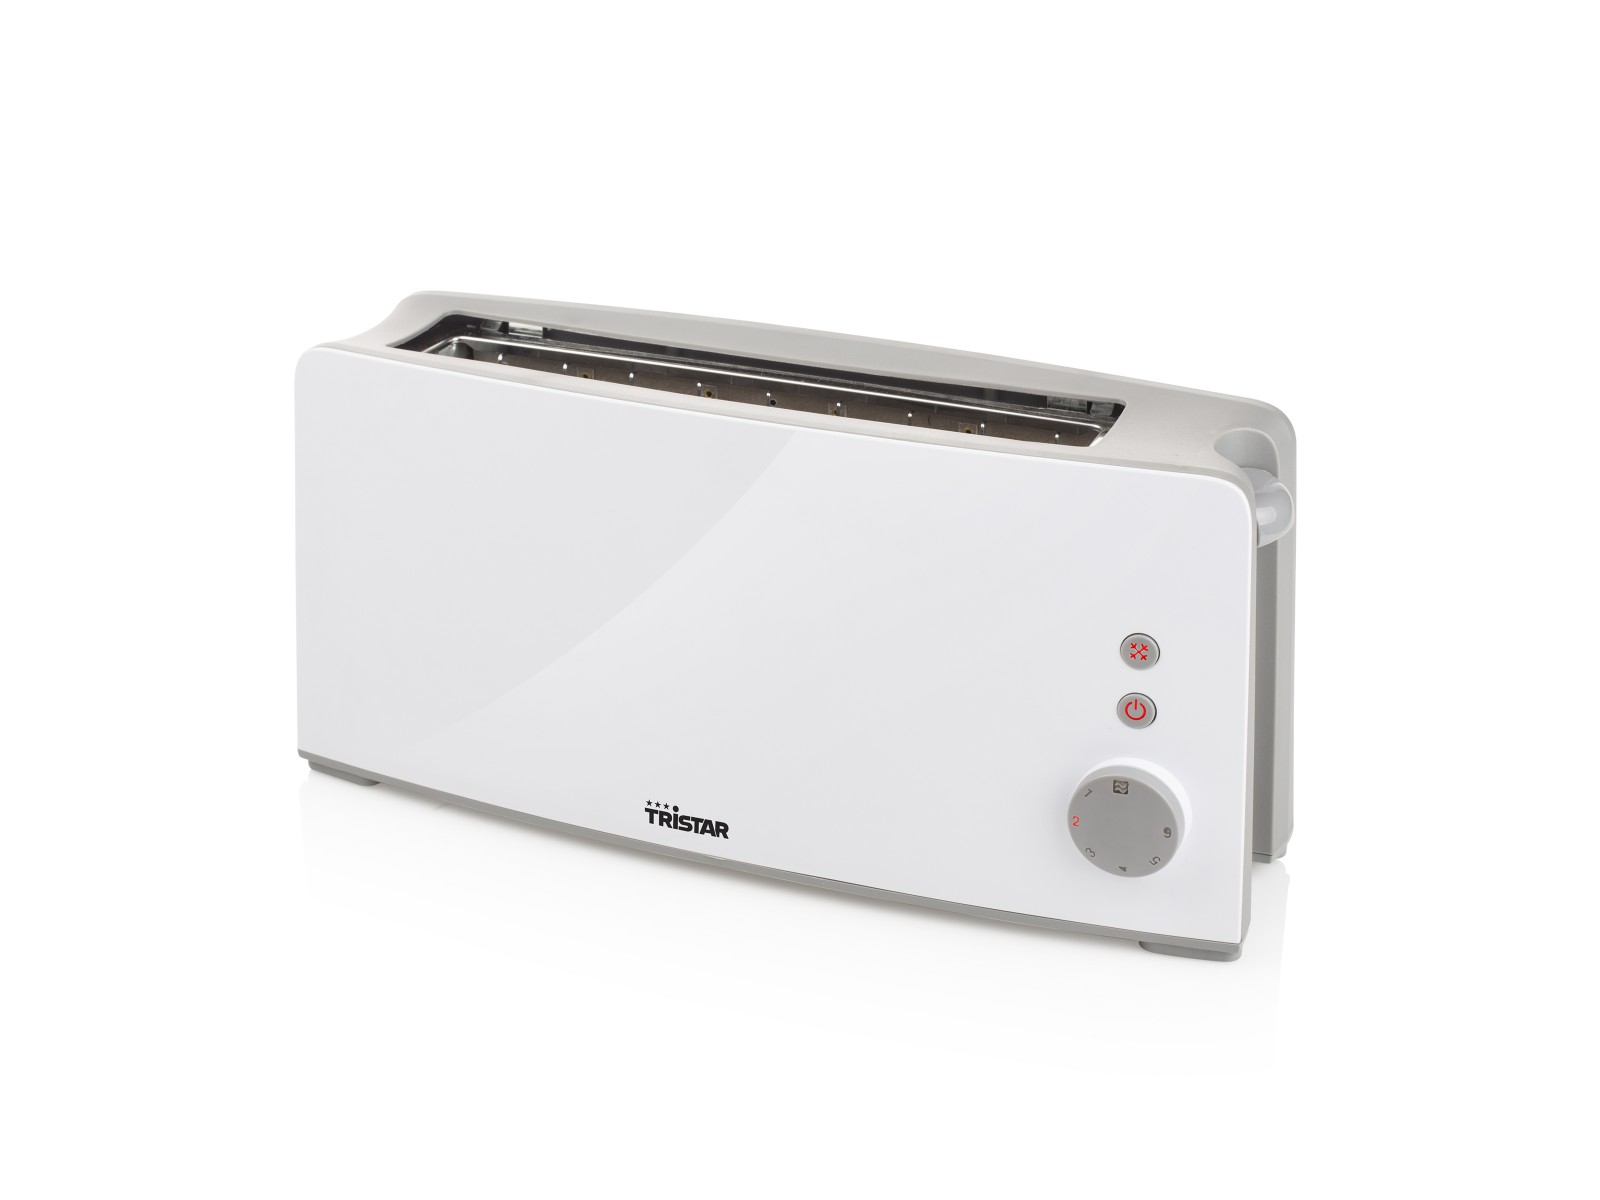 Langschlitz Toaster Tristar BR-1024 – Bild 1